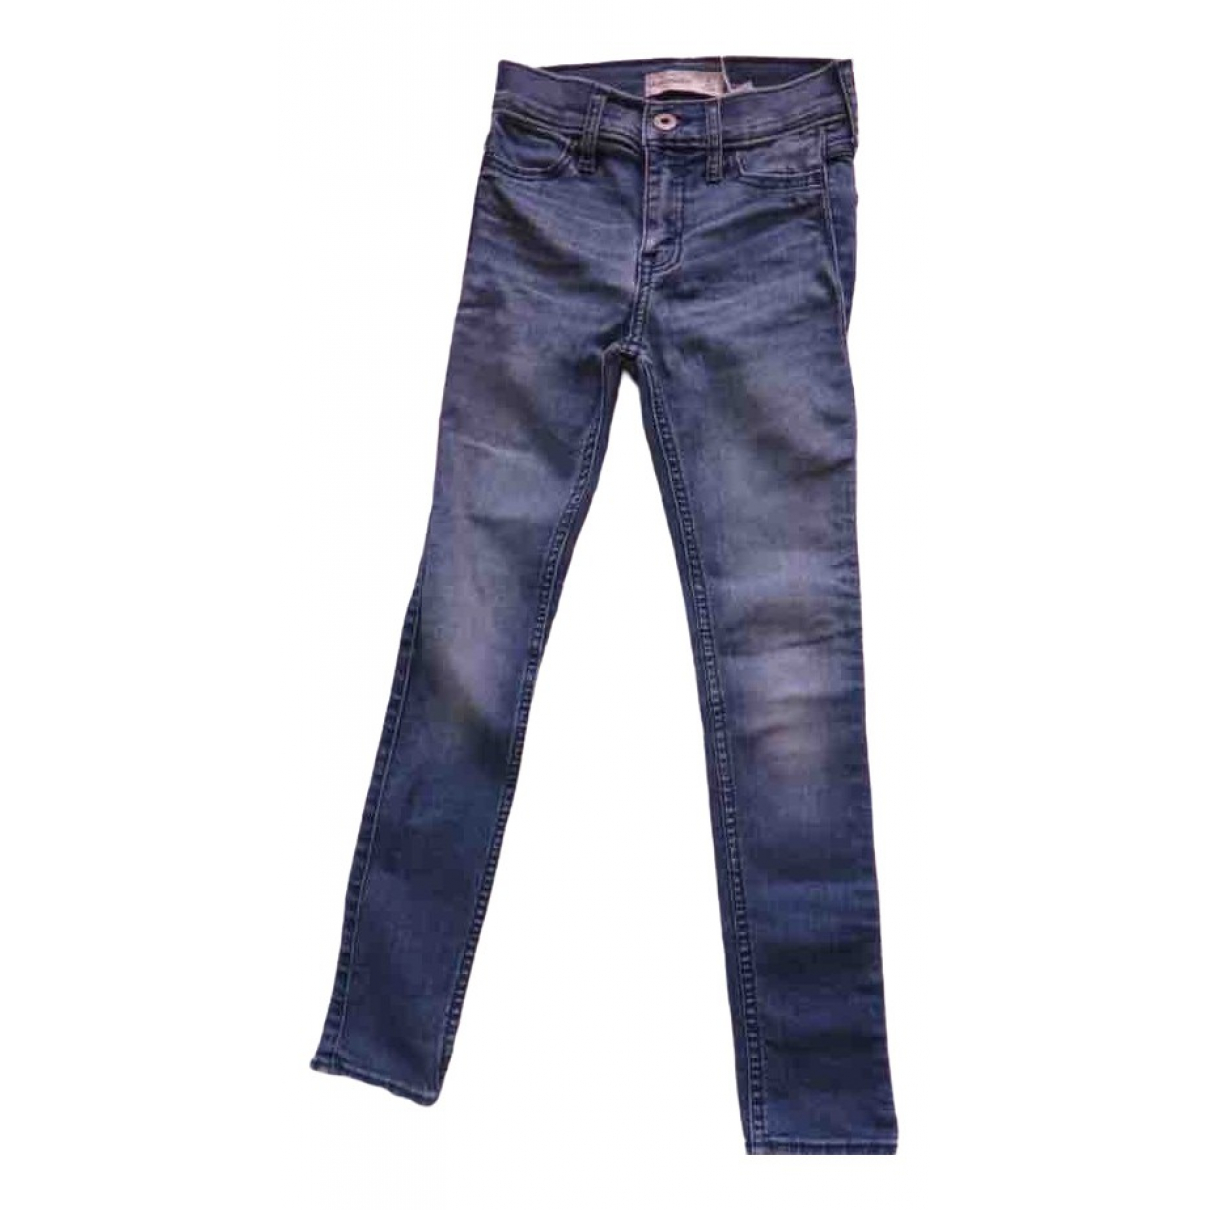 Pantalones en Denim - Vaquero Azul Abercrombie & Fitch